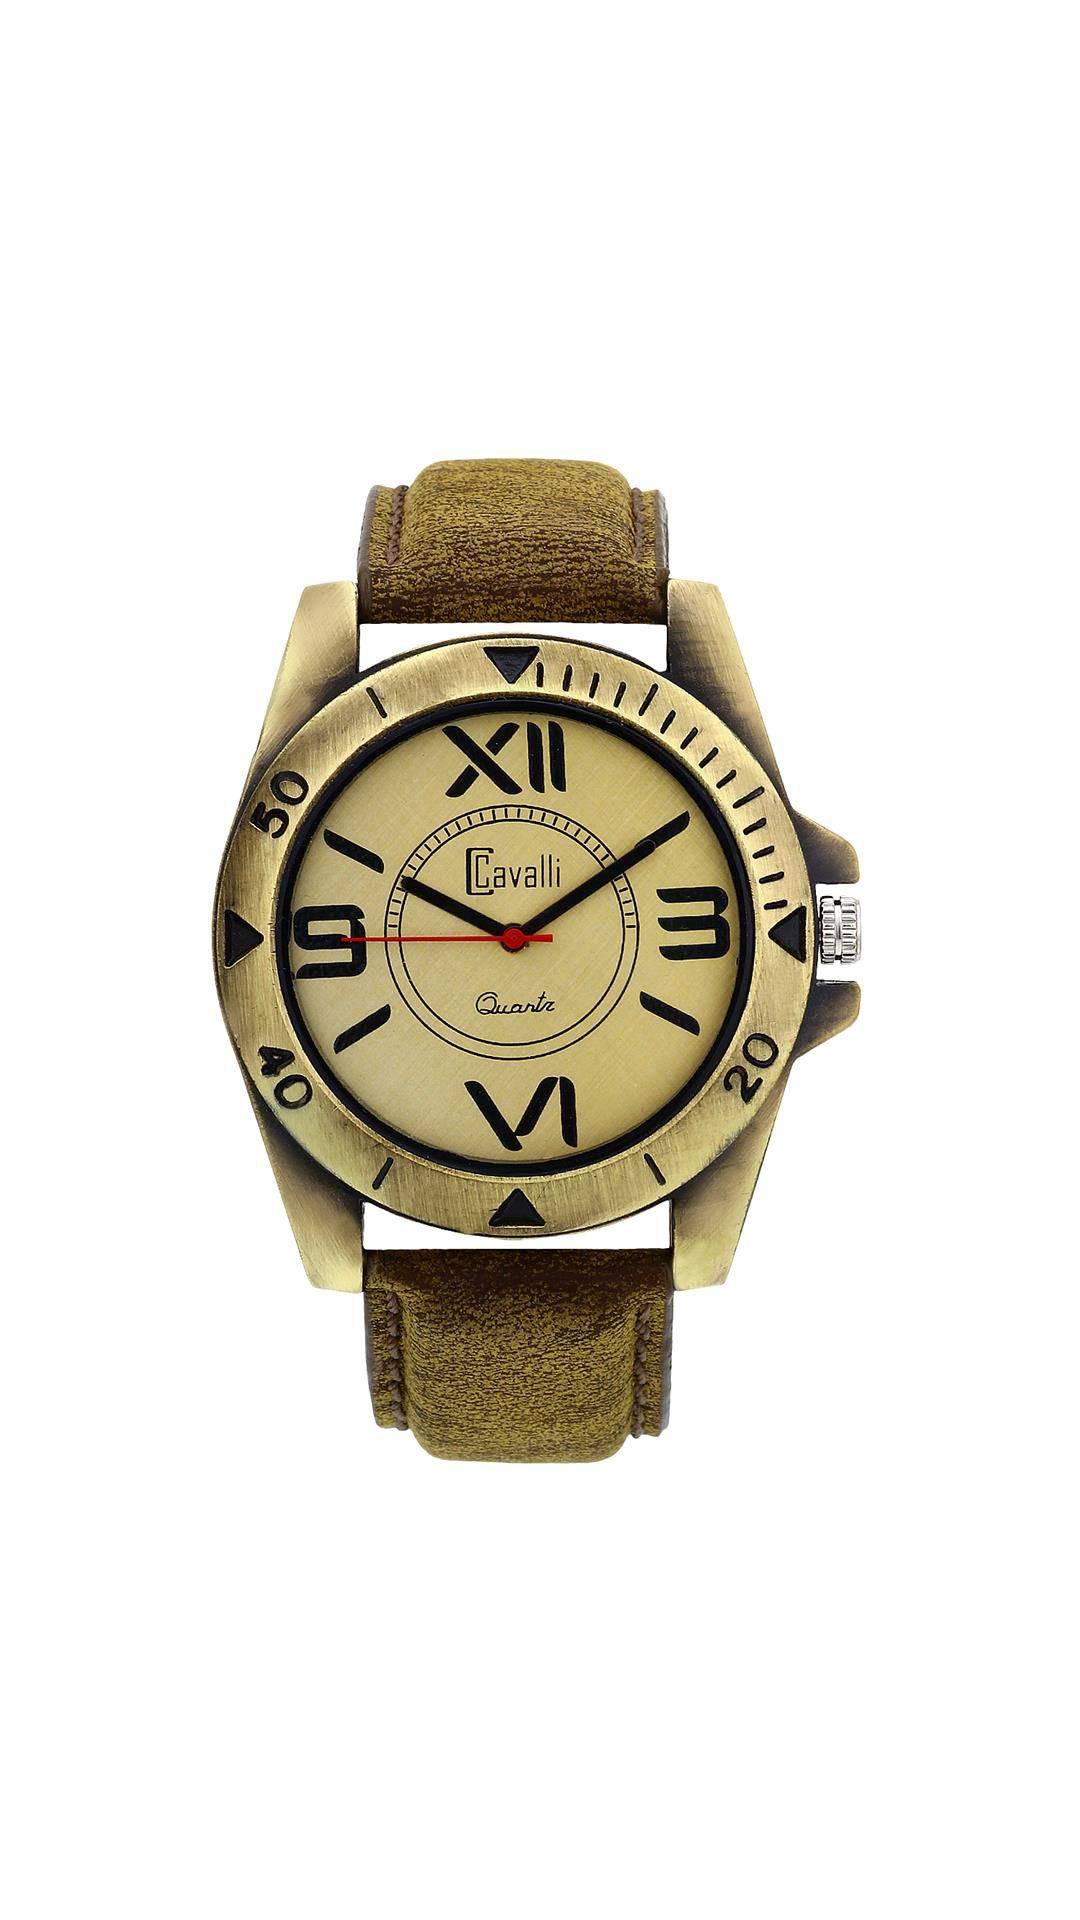 Cavalli Designer   Stylish Antique Gold Analog Watch for Men